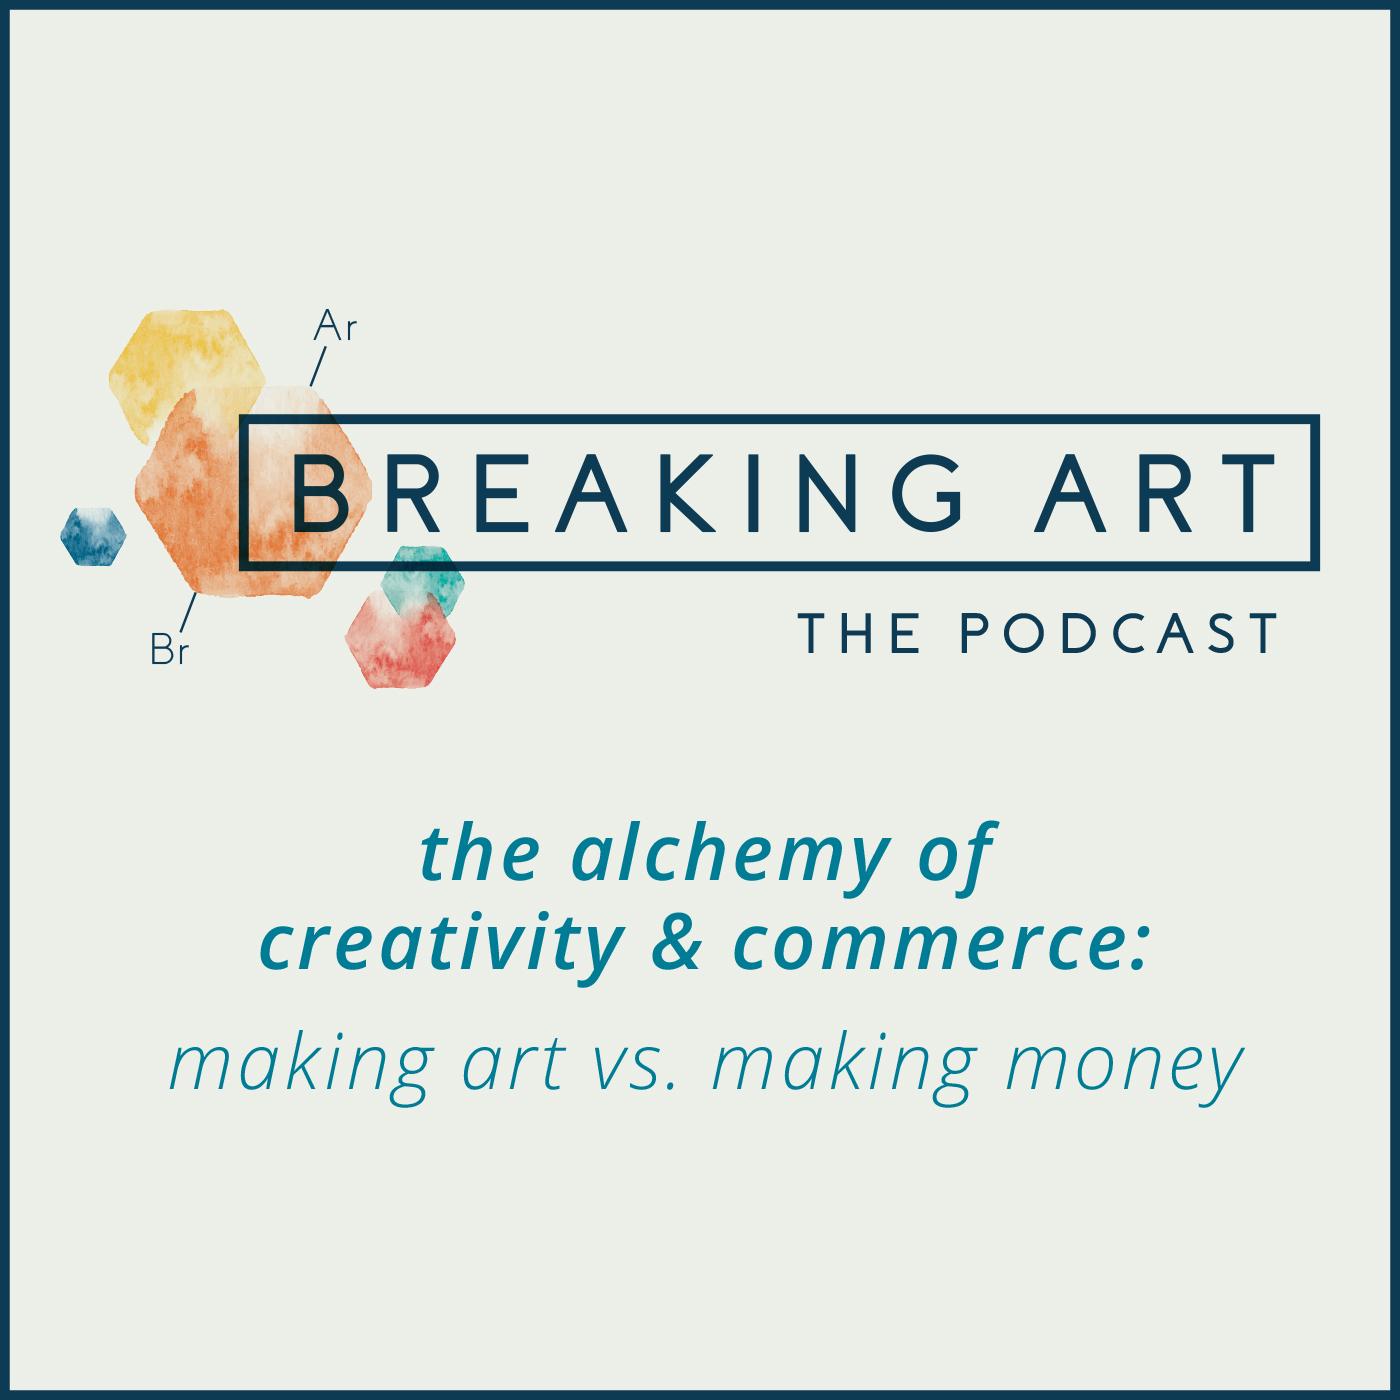 Breaking Art: The Podcast